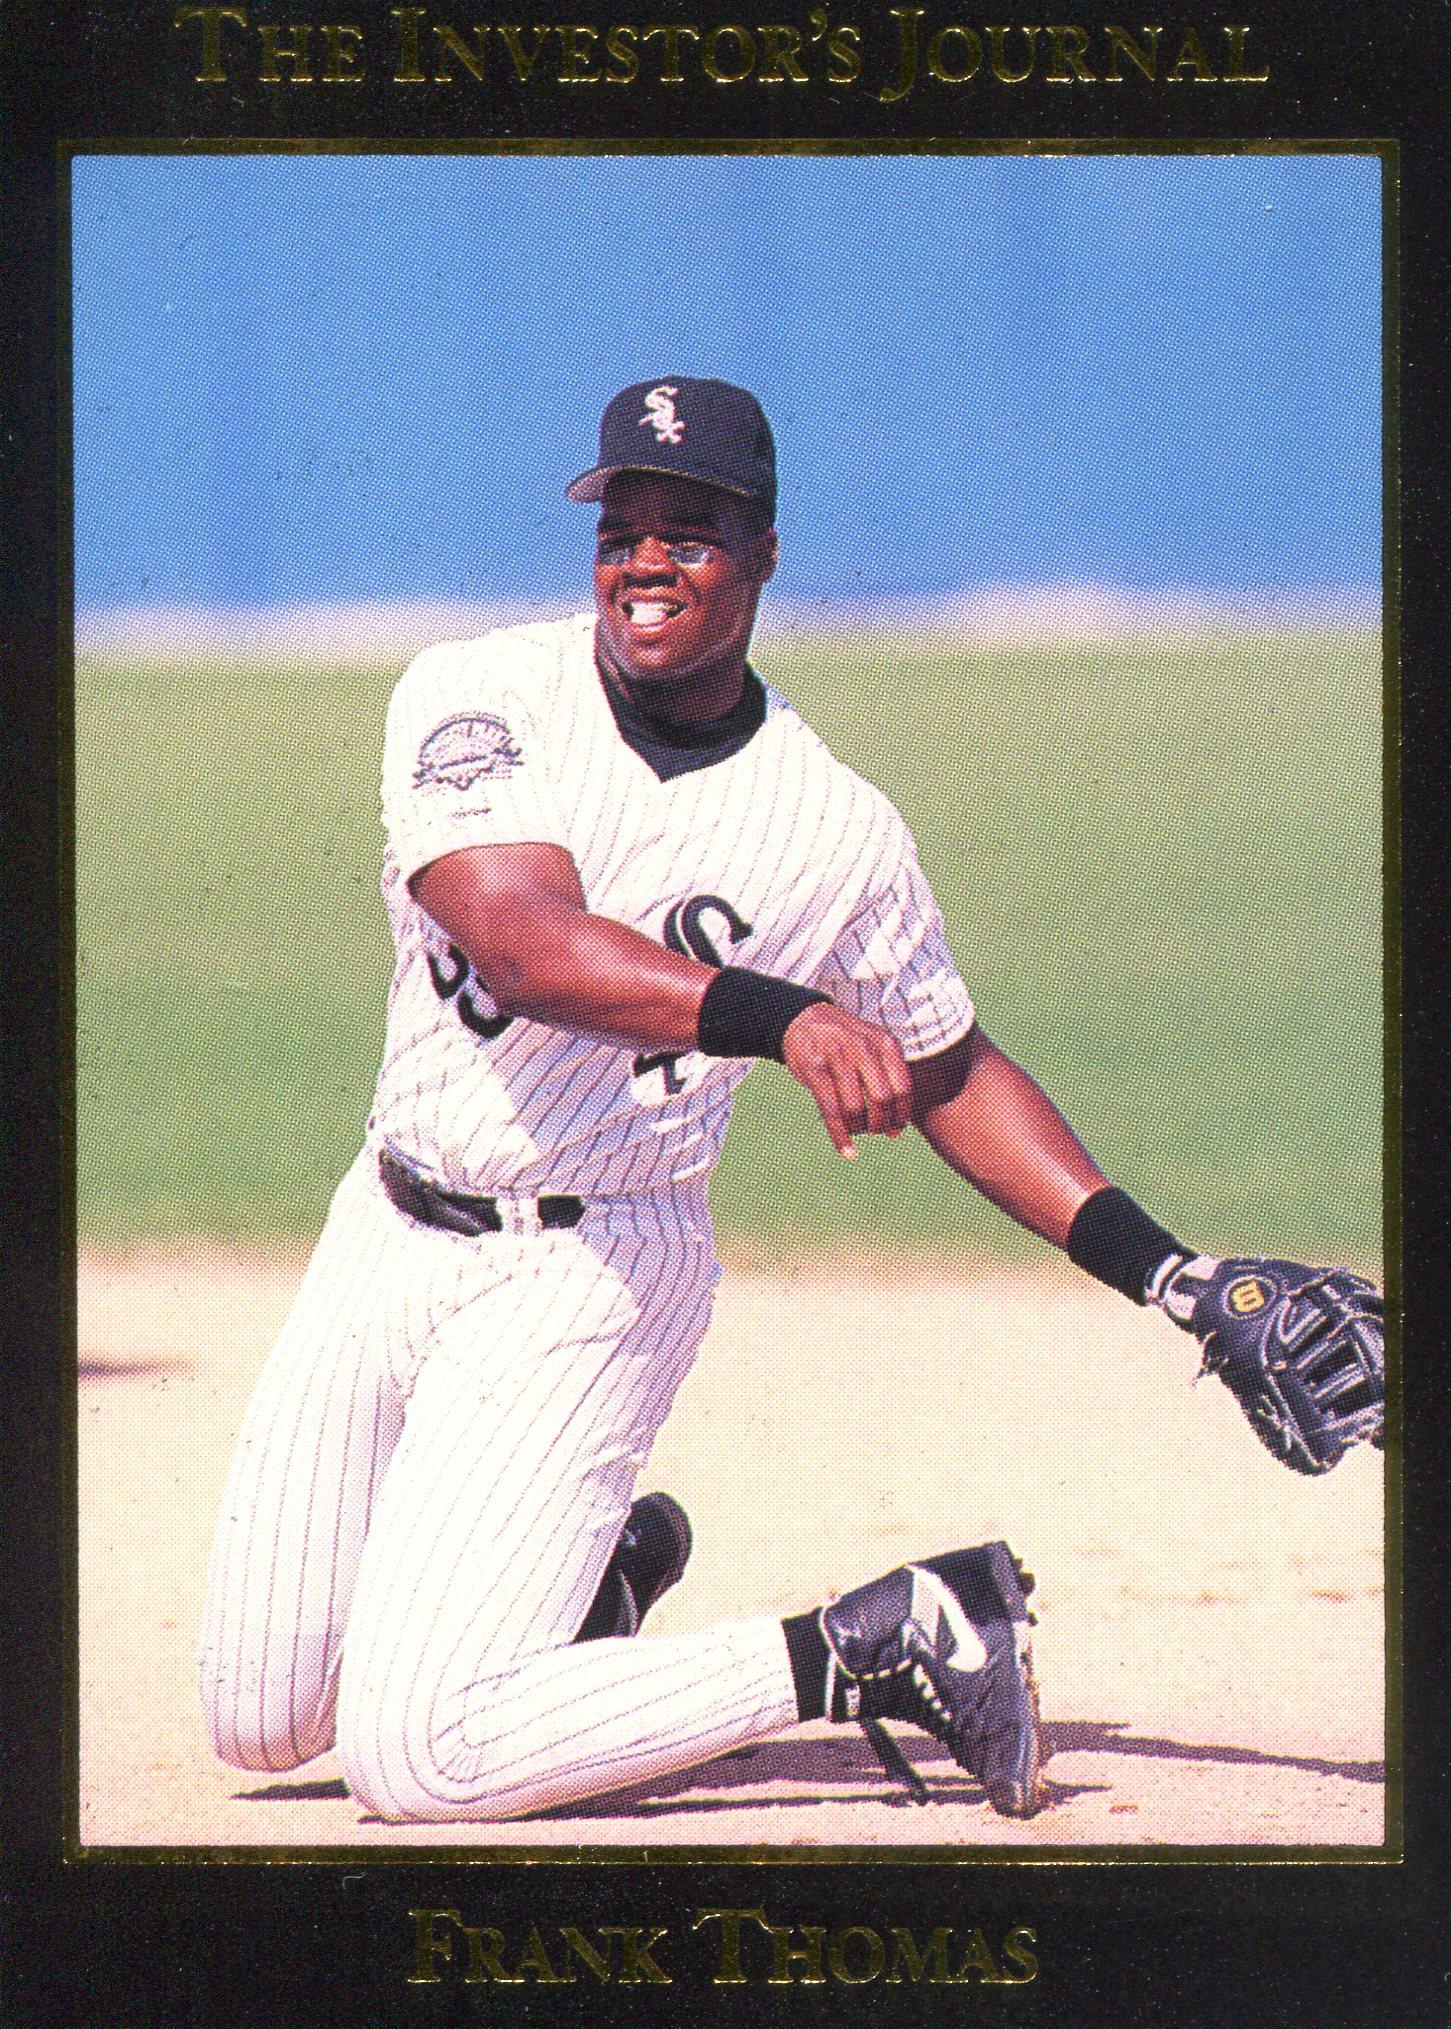 1993 Investors Journal Black Gold Foil Baseball Card 13 Frank